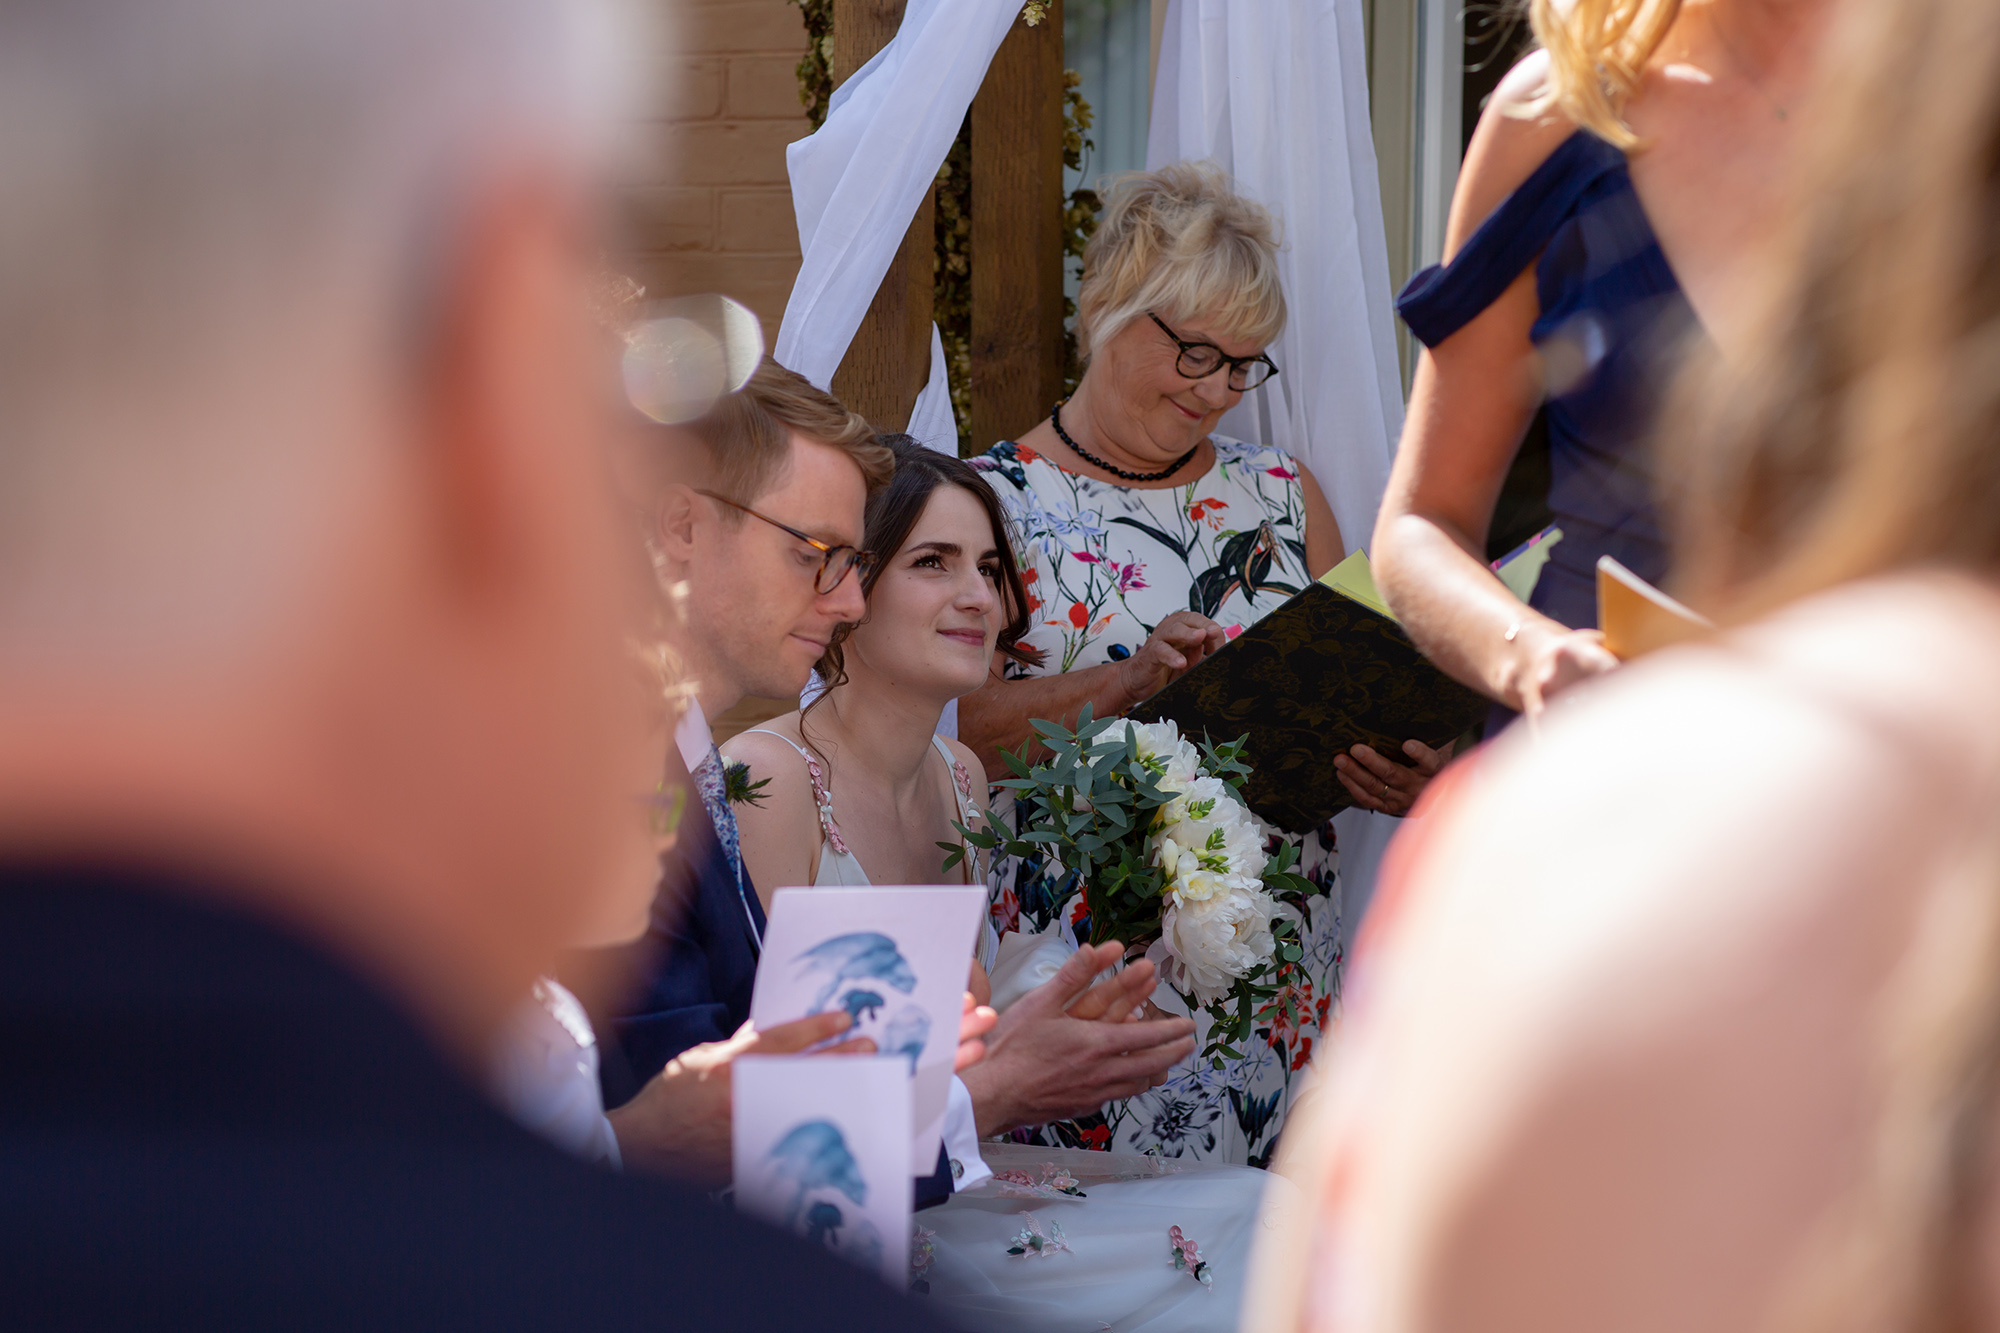 chichester_wedding_photographer_london_juliatoms_018.jpg